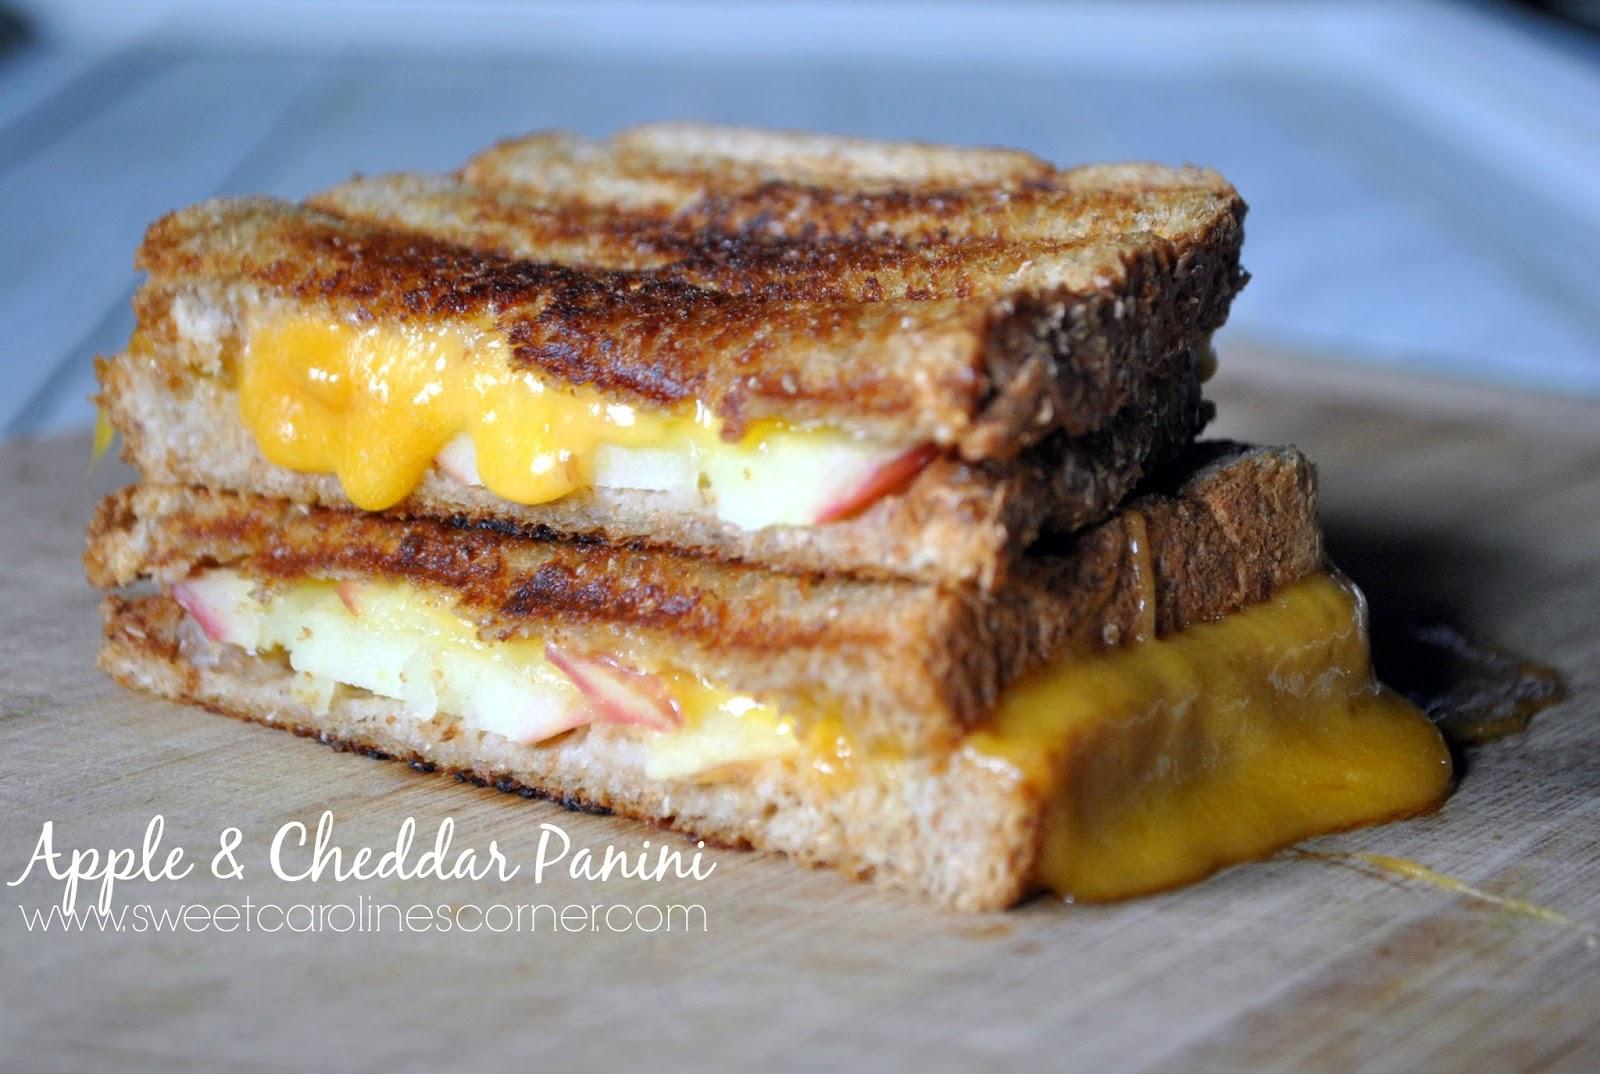 apple & cheddar panini (panini de maçã & queijo cheddar)